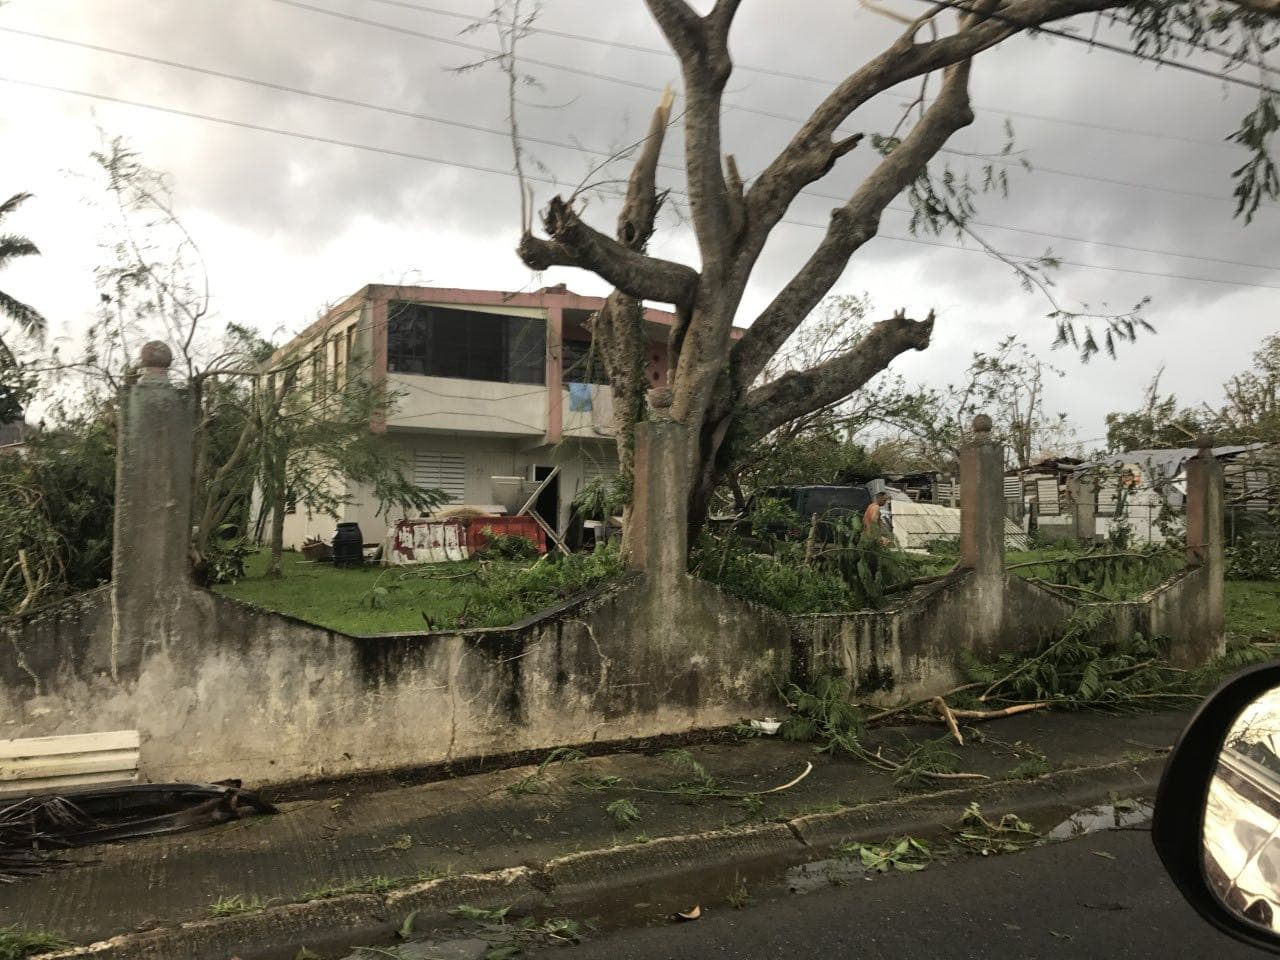 Hurricane Maria damage in Puerto Rico in September 2018